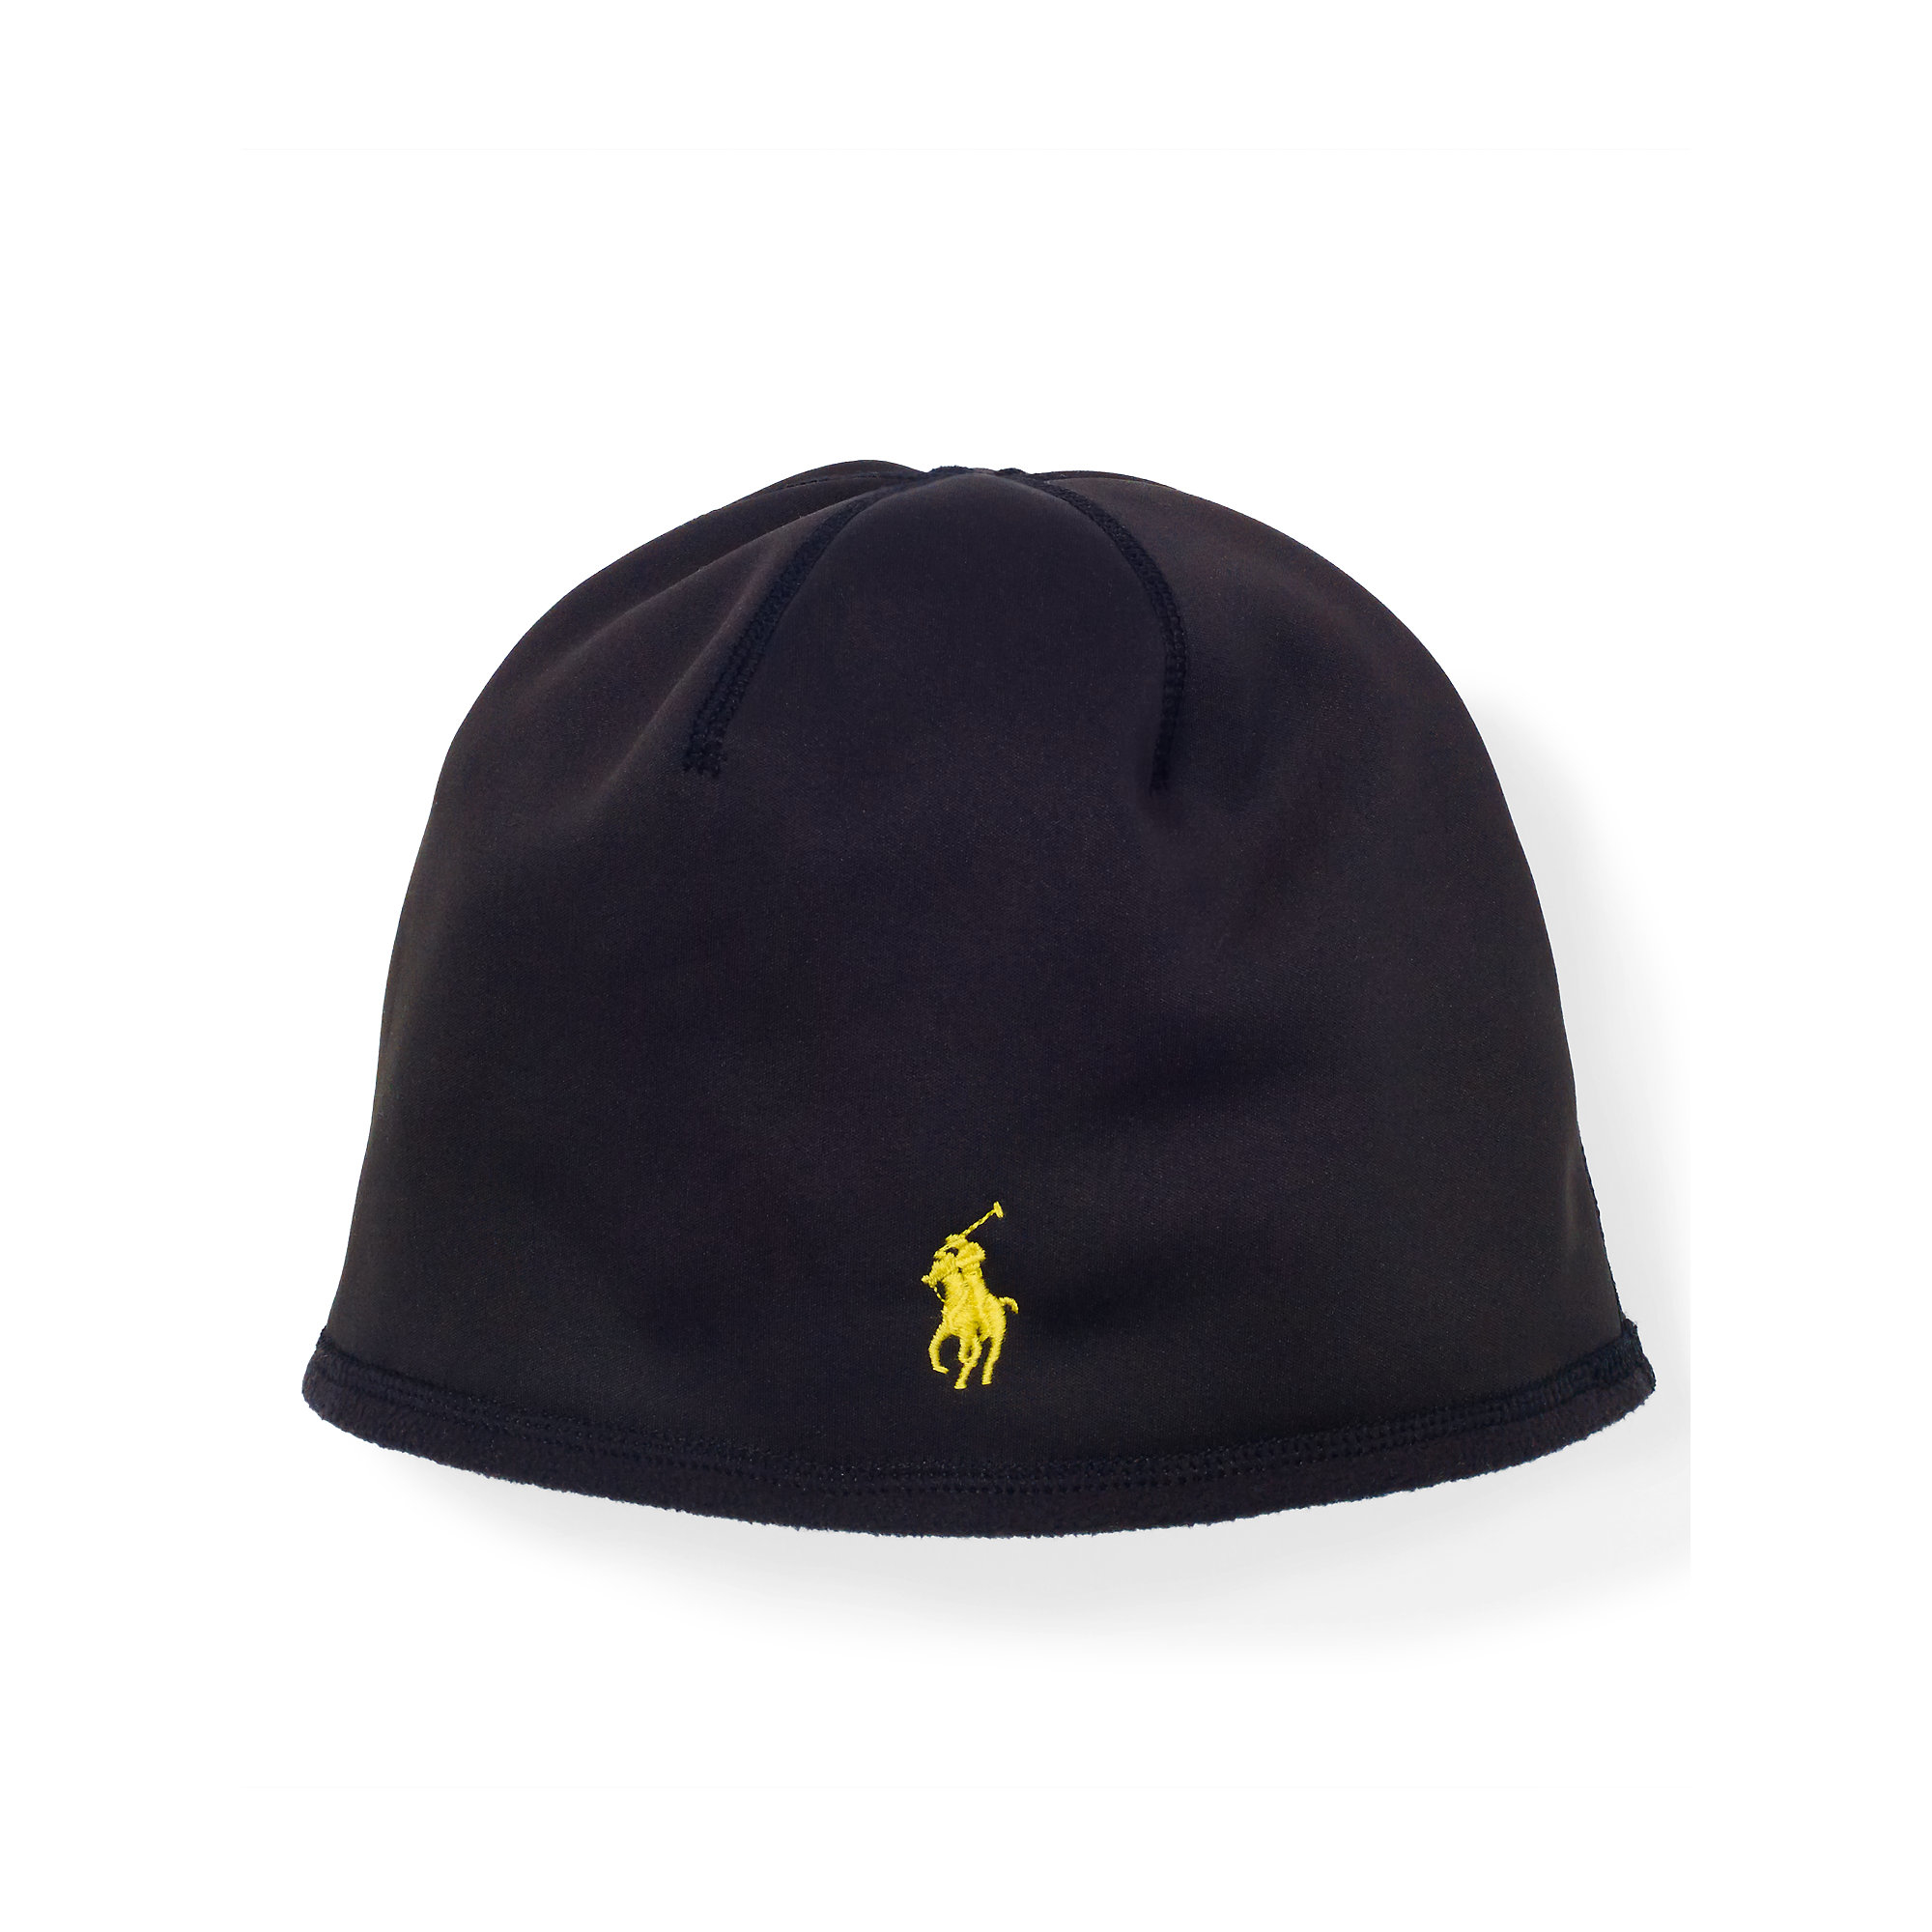 polo ralph lauren fleece skull cap in black for men lyst. Black Bedroom Furniture Sets. Home Design Ideas